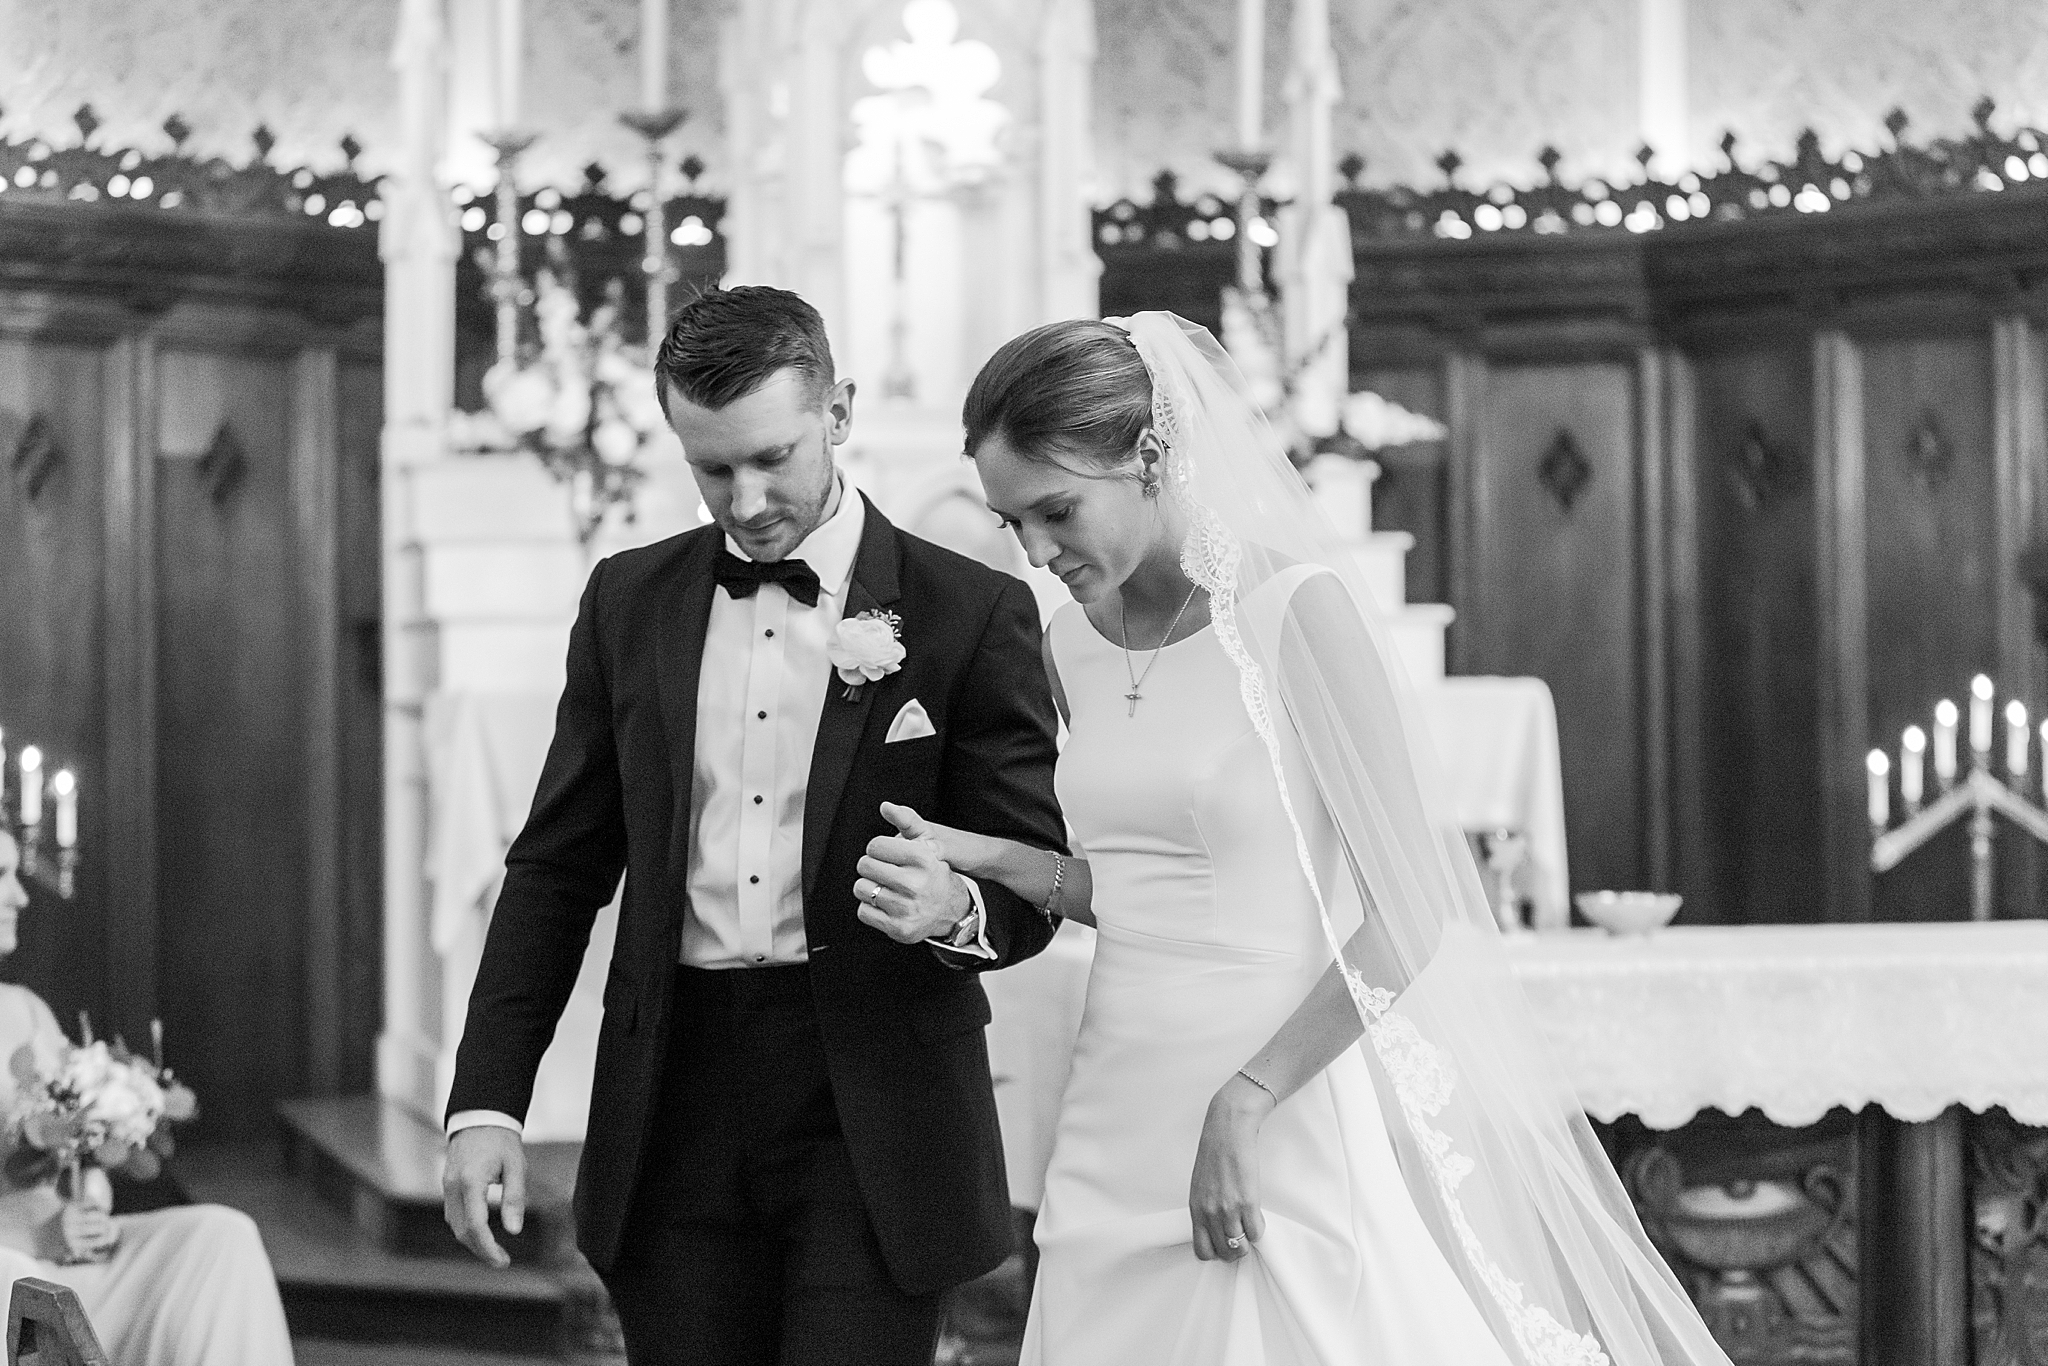 detroit-wedding-photographer-grosse-pointe-academy-chapel-detroit-golf-club-wedding-carly-matt-by-courtney-carolyn-photography_0049.jpg